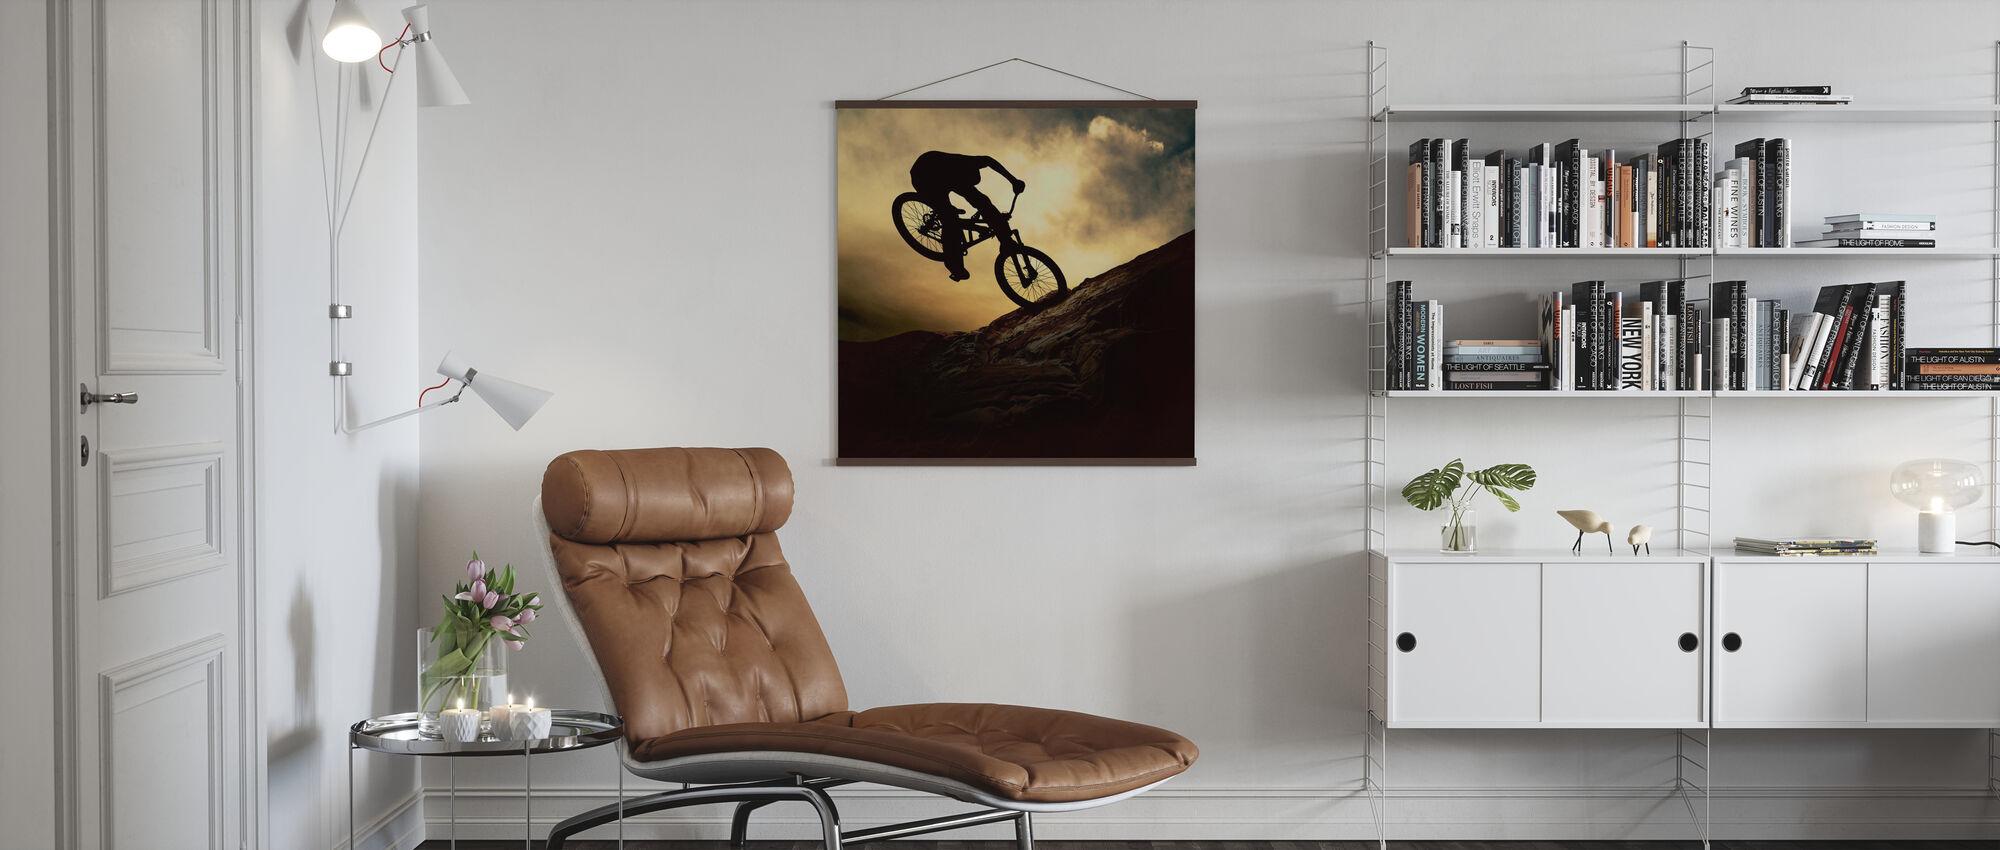 Mountainbike rytter - Plakat - Stue